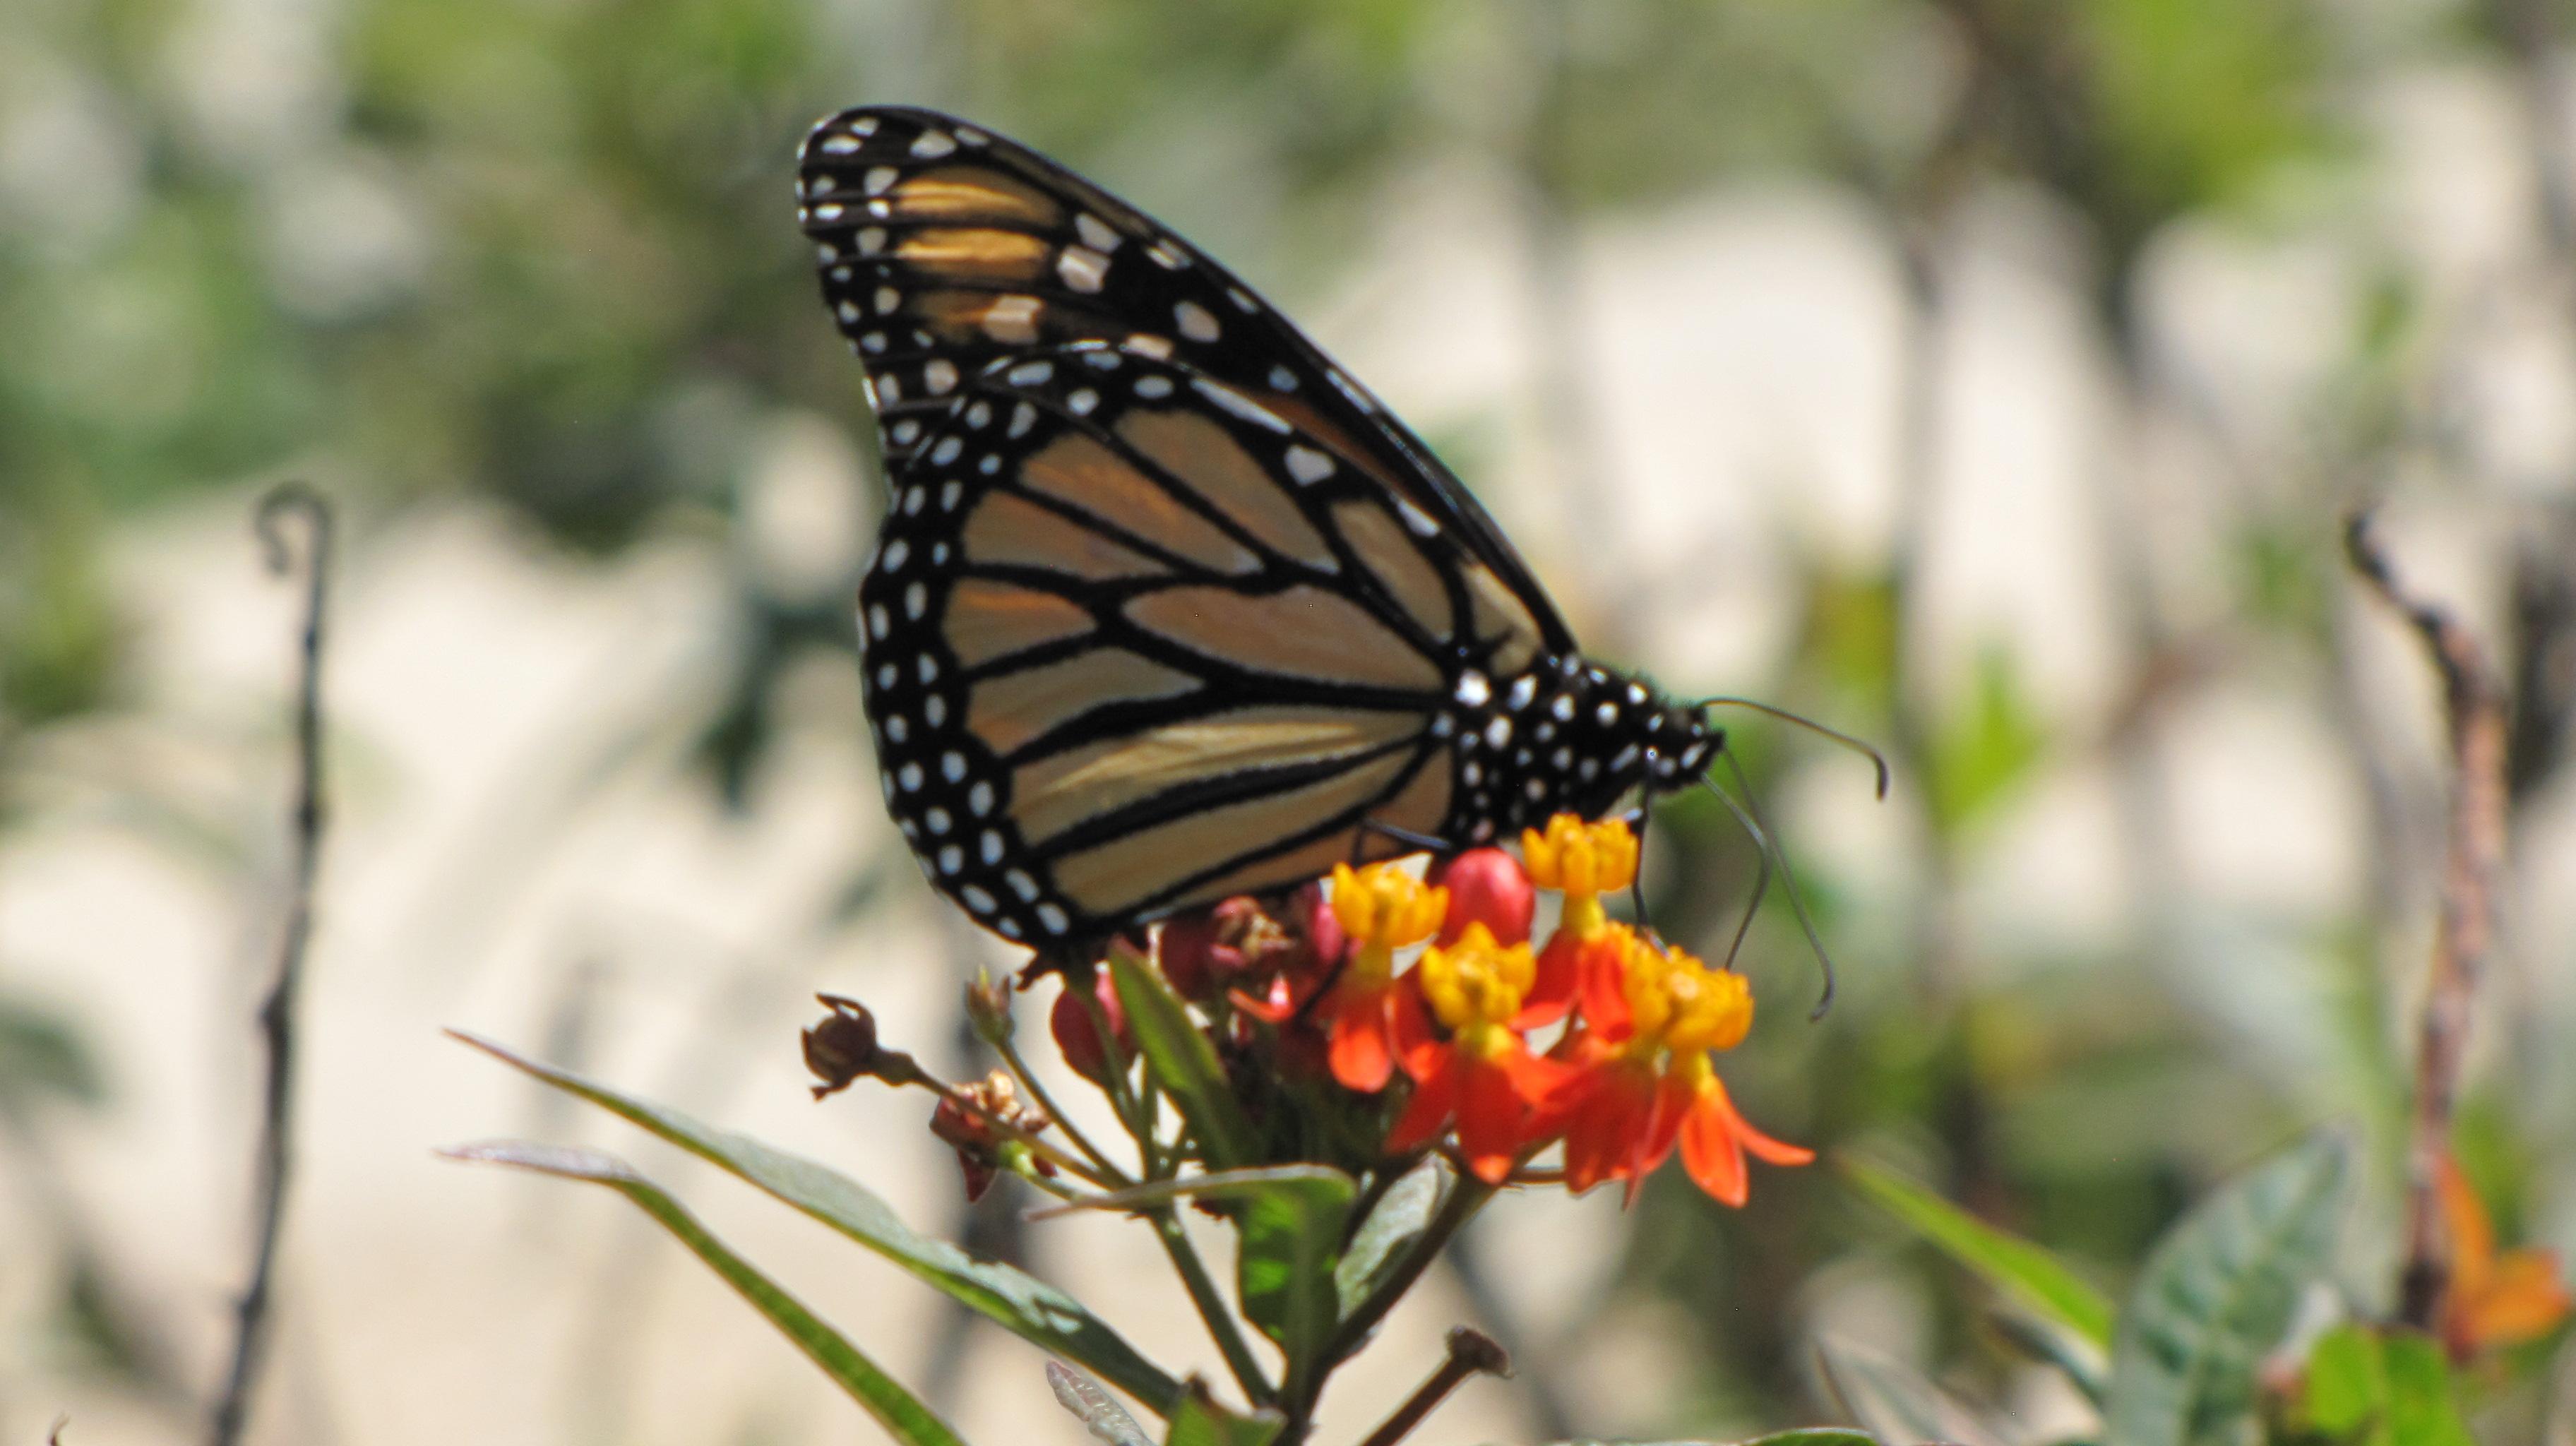 Queen, Monarch Caterpillars and Butterflies: How to Tell ...